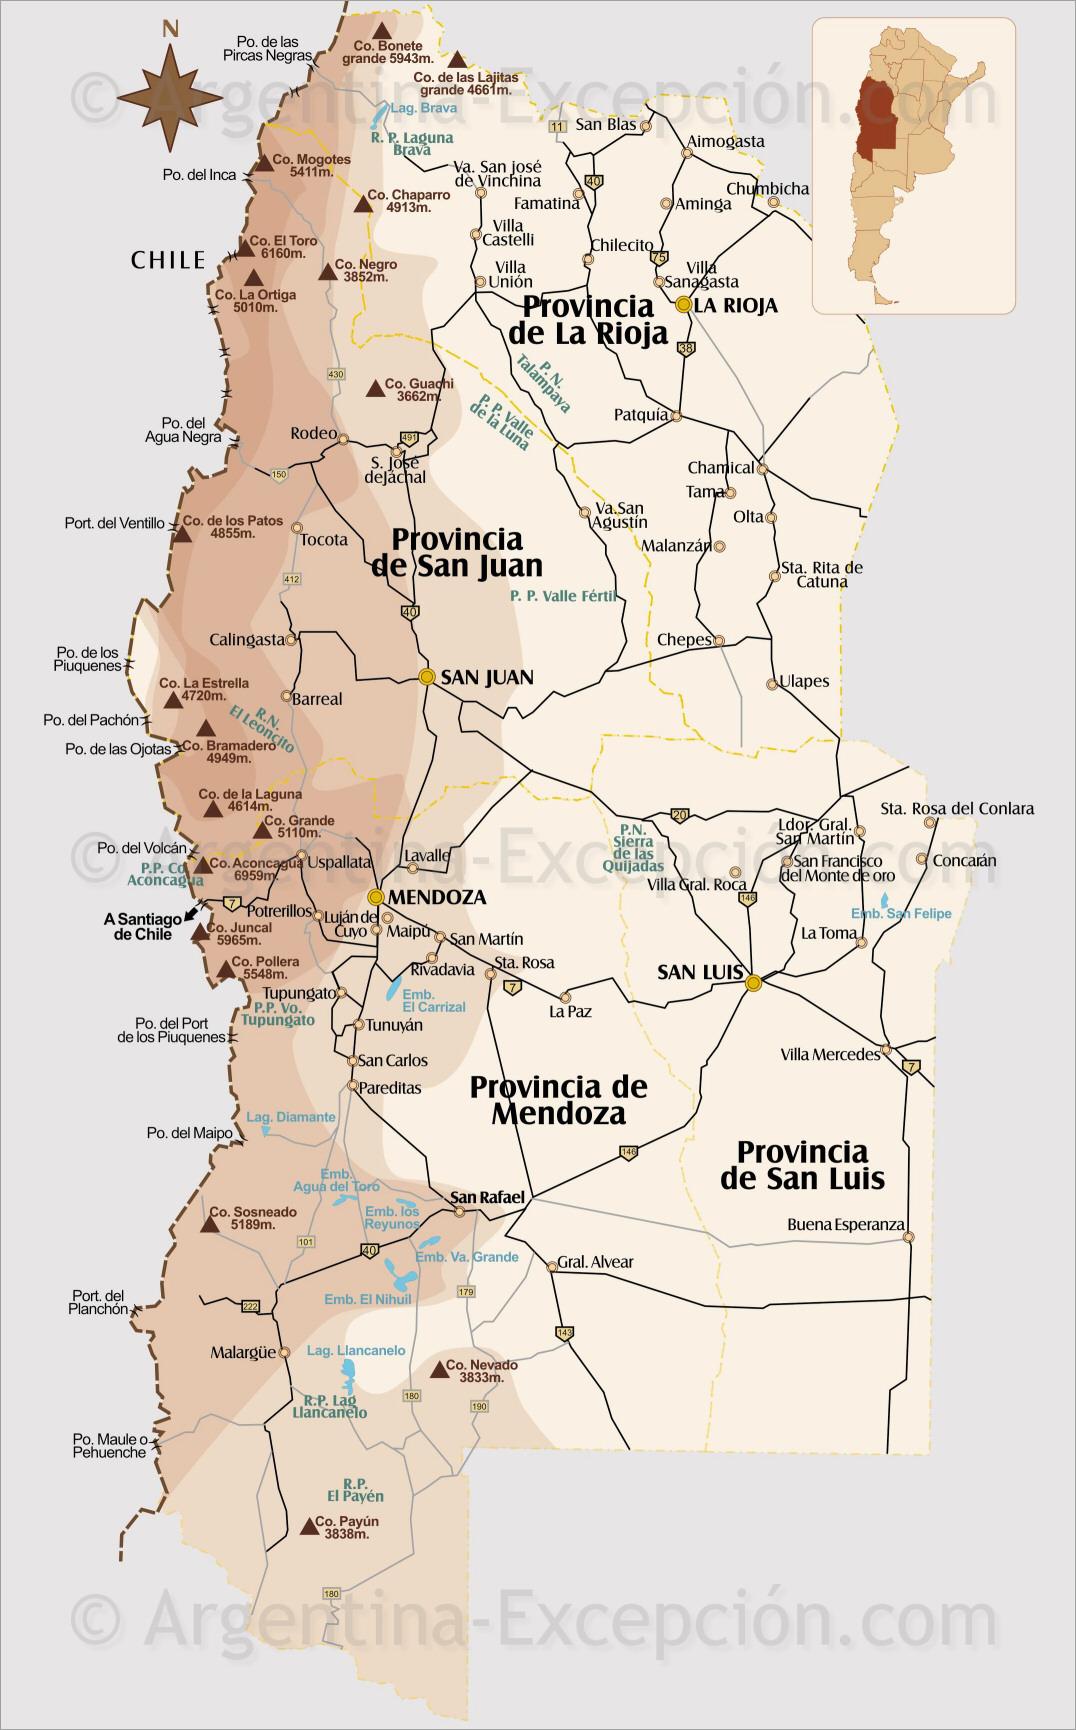 Map of Cuyo, Mendoza, Argentina